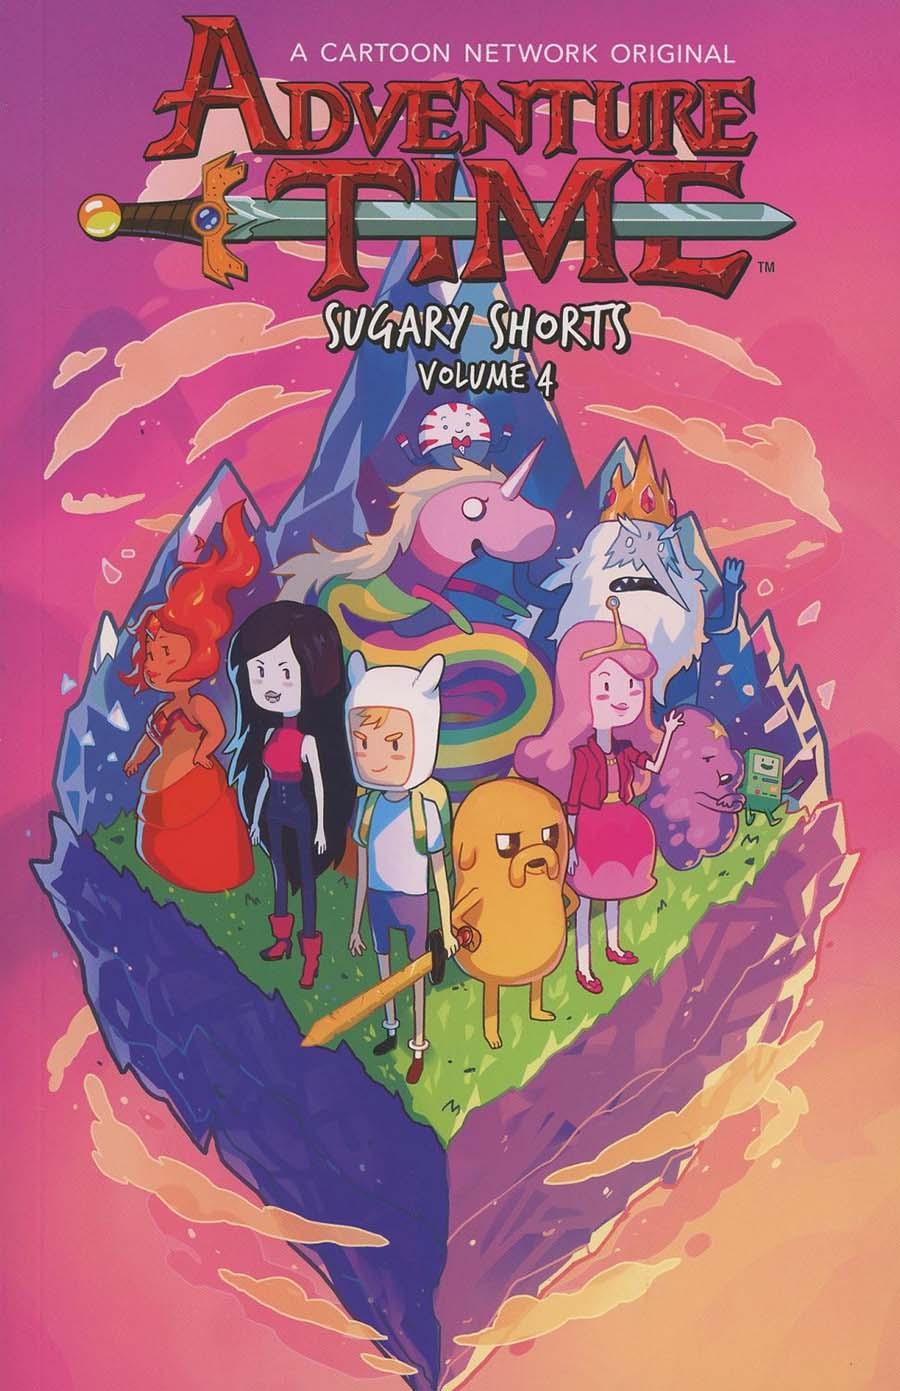 Adventure Time Sugary Shorts Vol 4 TP